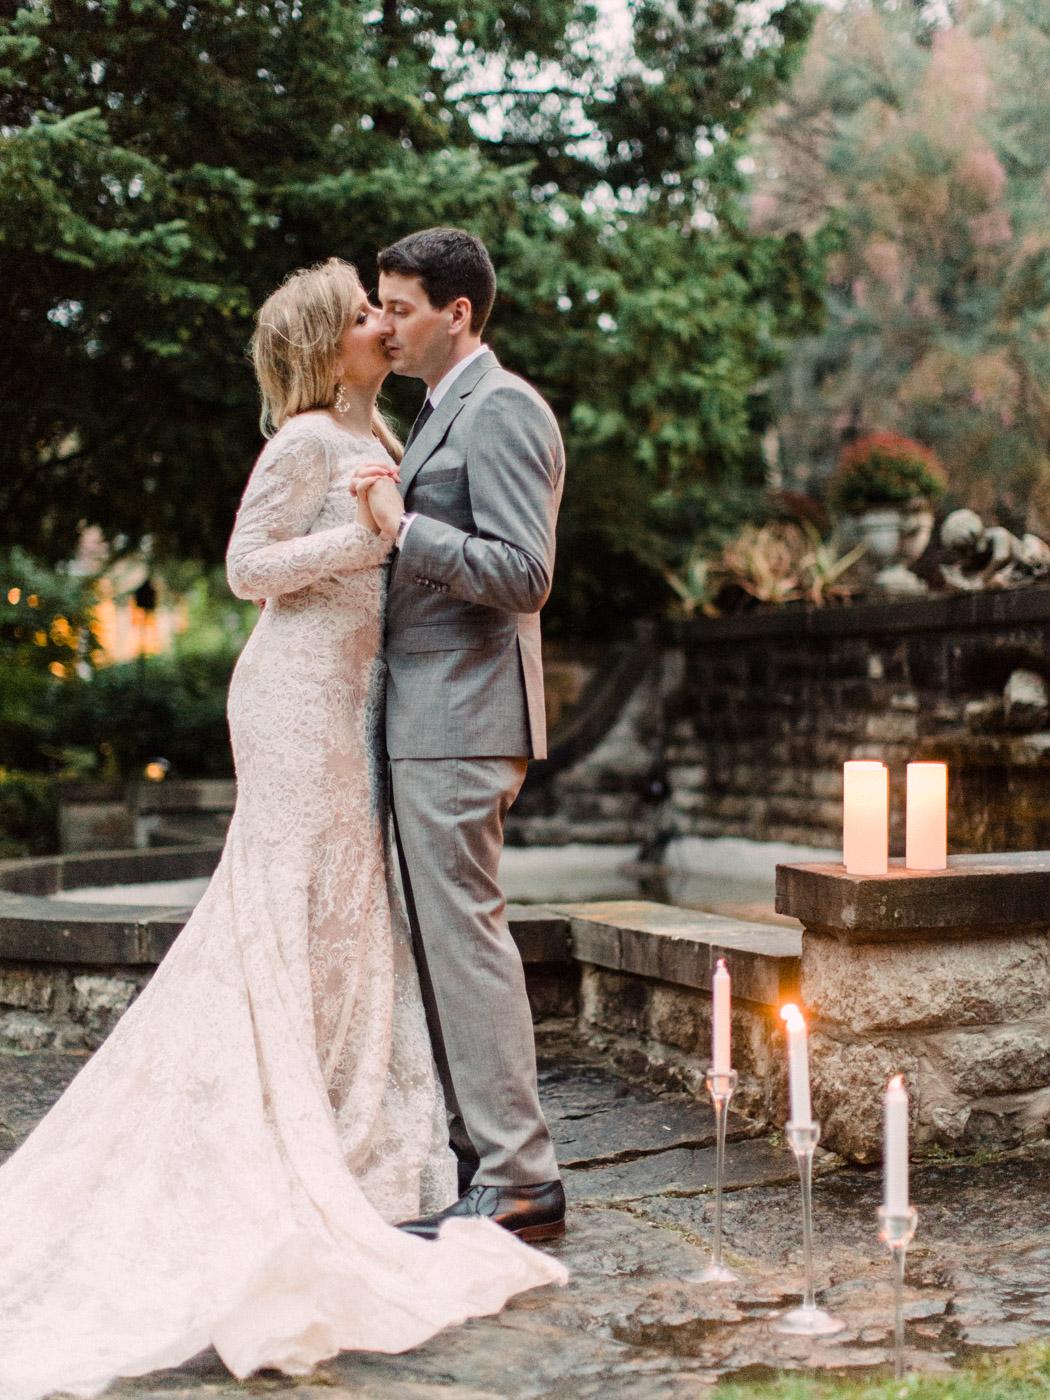 Toronto-wedding-photographer-intimate-classic-fine-art-elopement-ottawa94.jpg